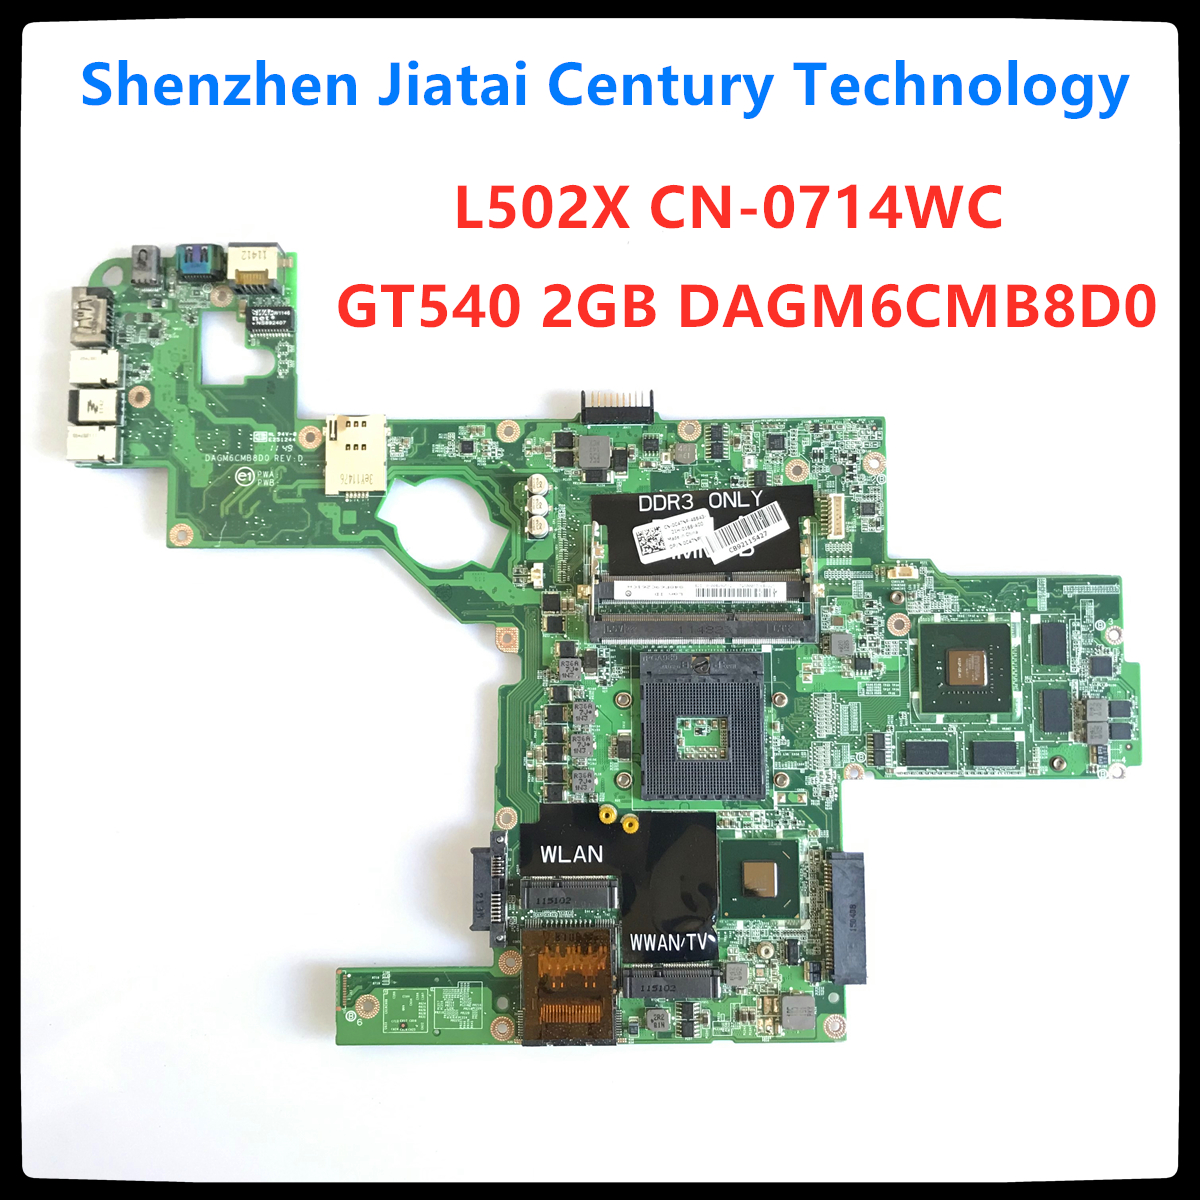 DAGM6CMB8D0 материнская плата для ноутбука Dell XPS L502X материнская плата для ноутбука 714WC 0714WC CN-0714WC GT540M 2G полный Тесты работы 100% оригинал